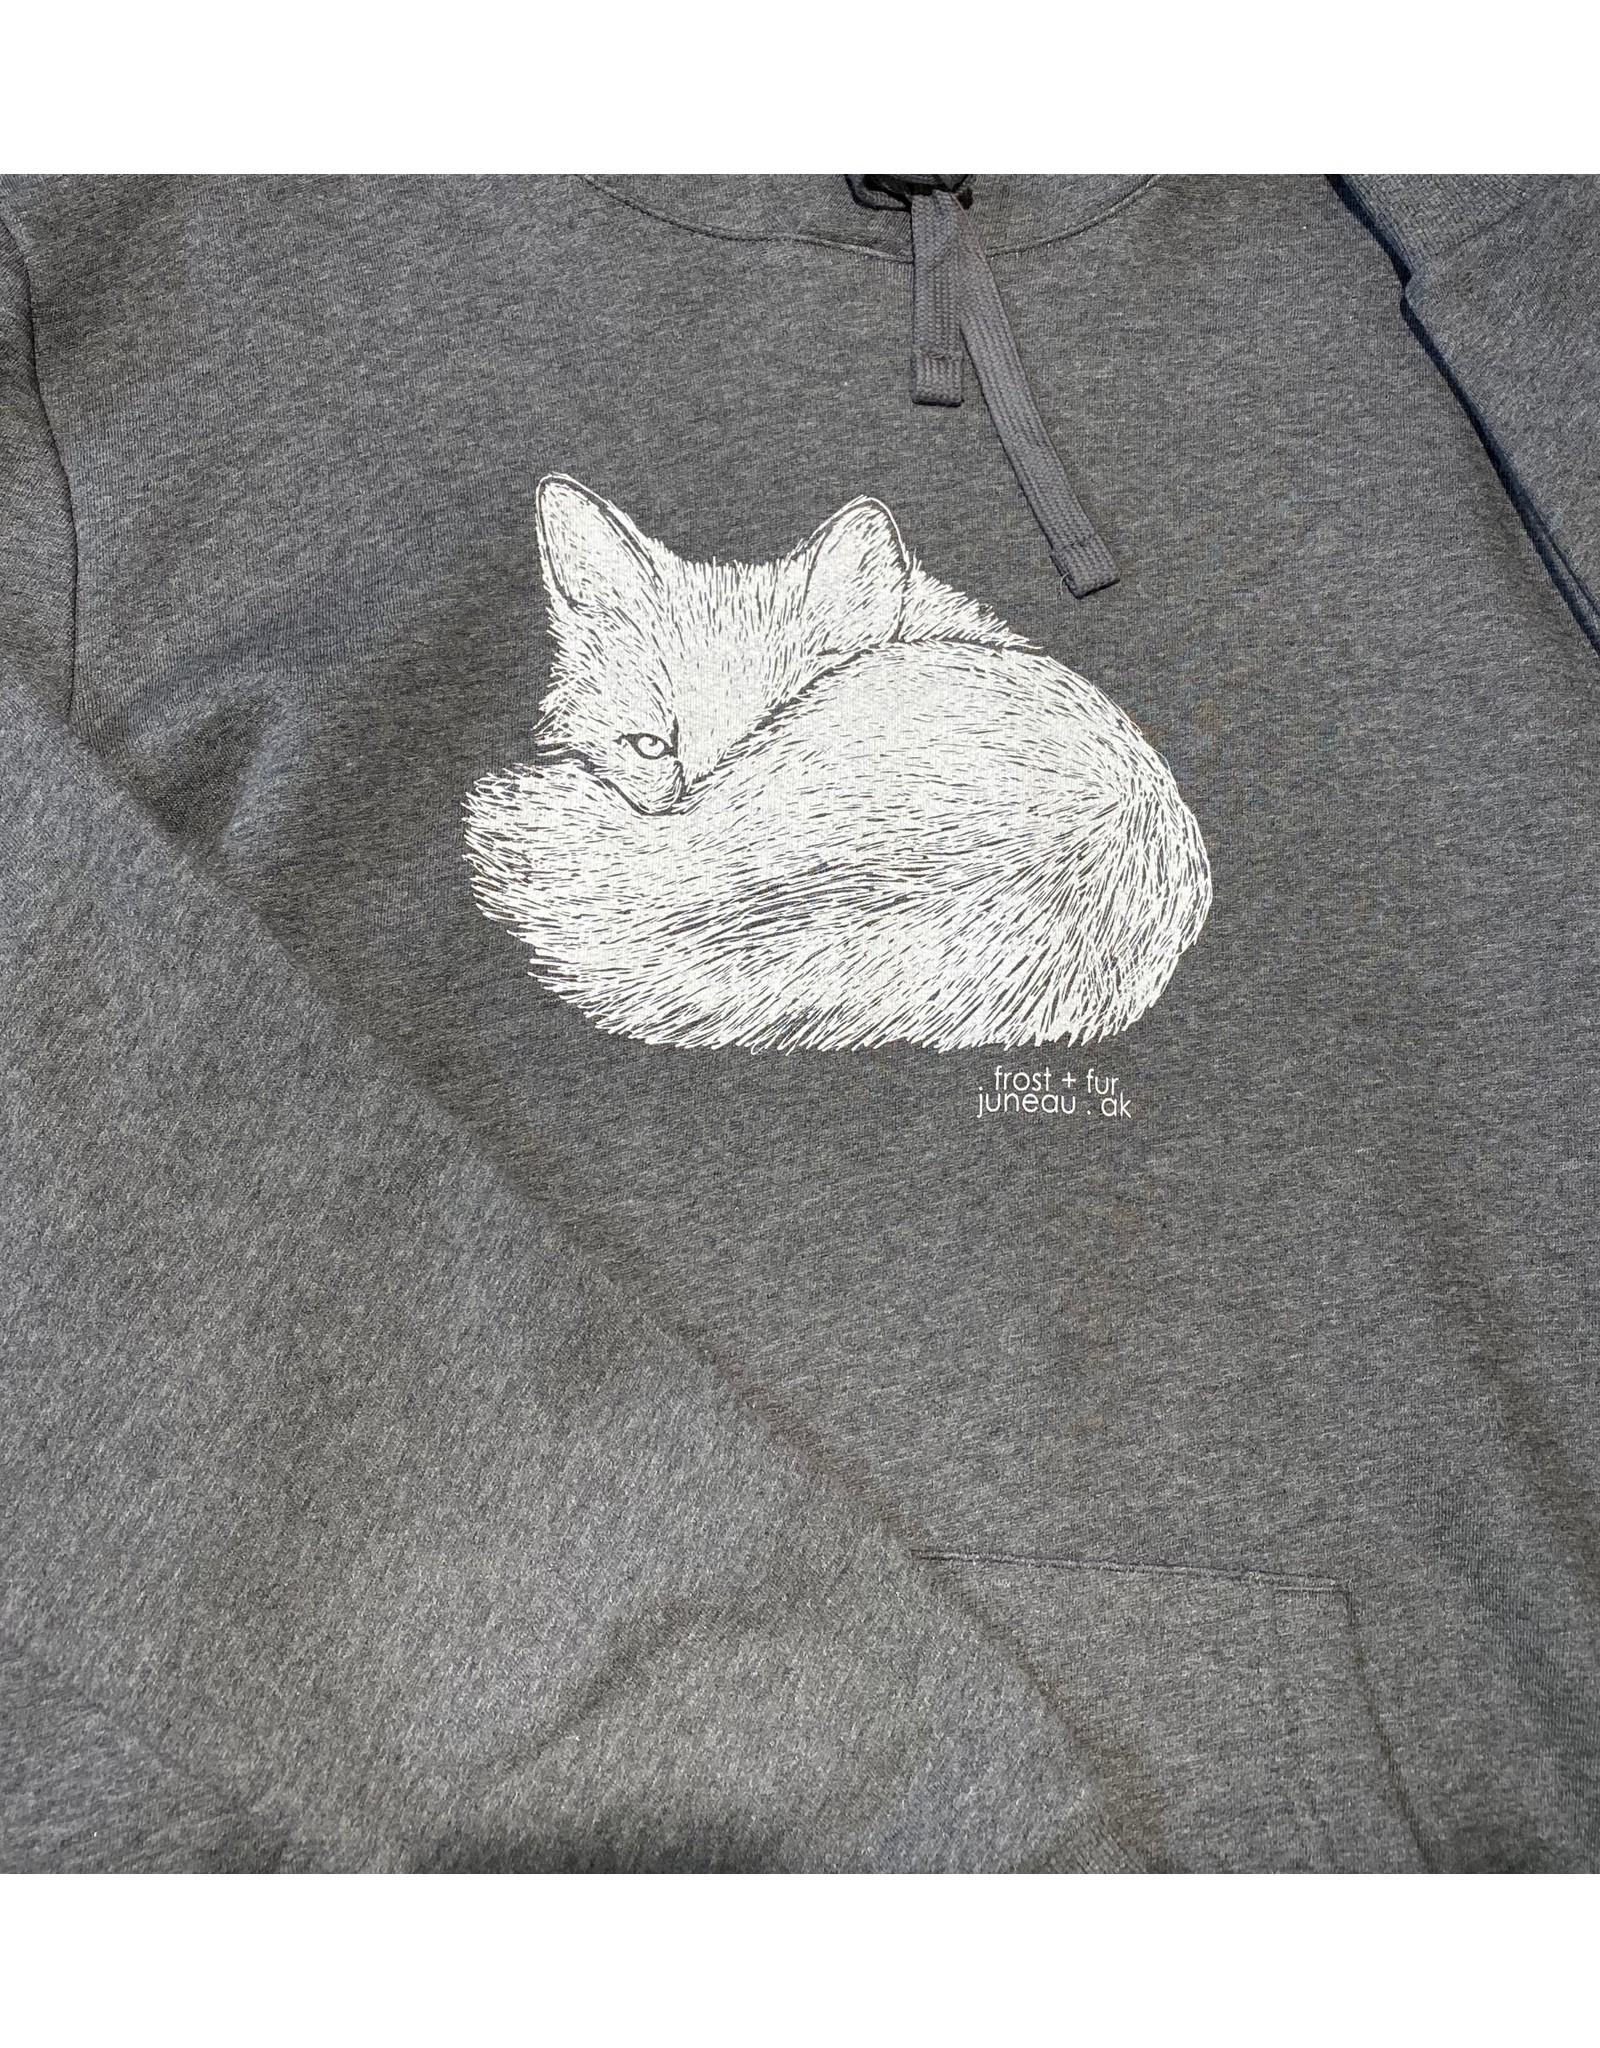 Frost + Fur Adult Hoodie (fox) | Frost + Fur